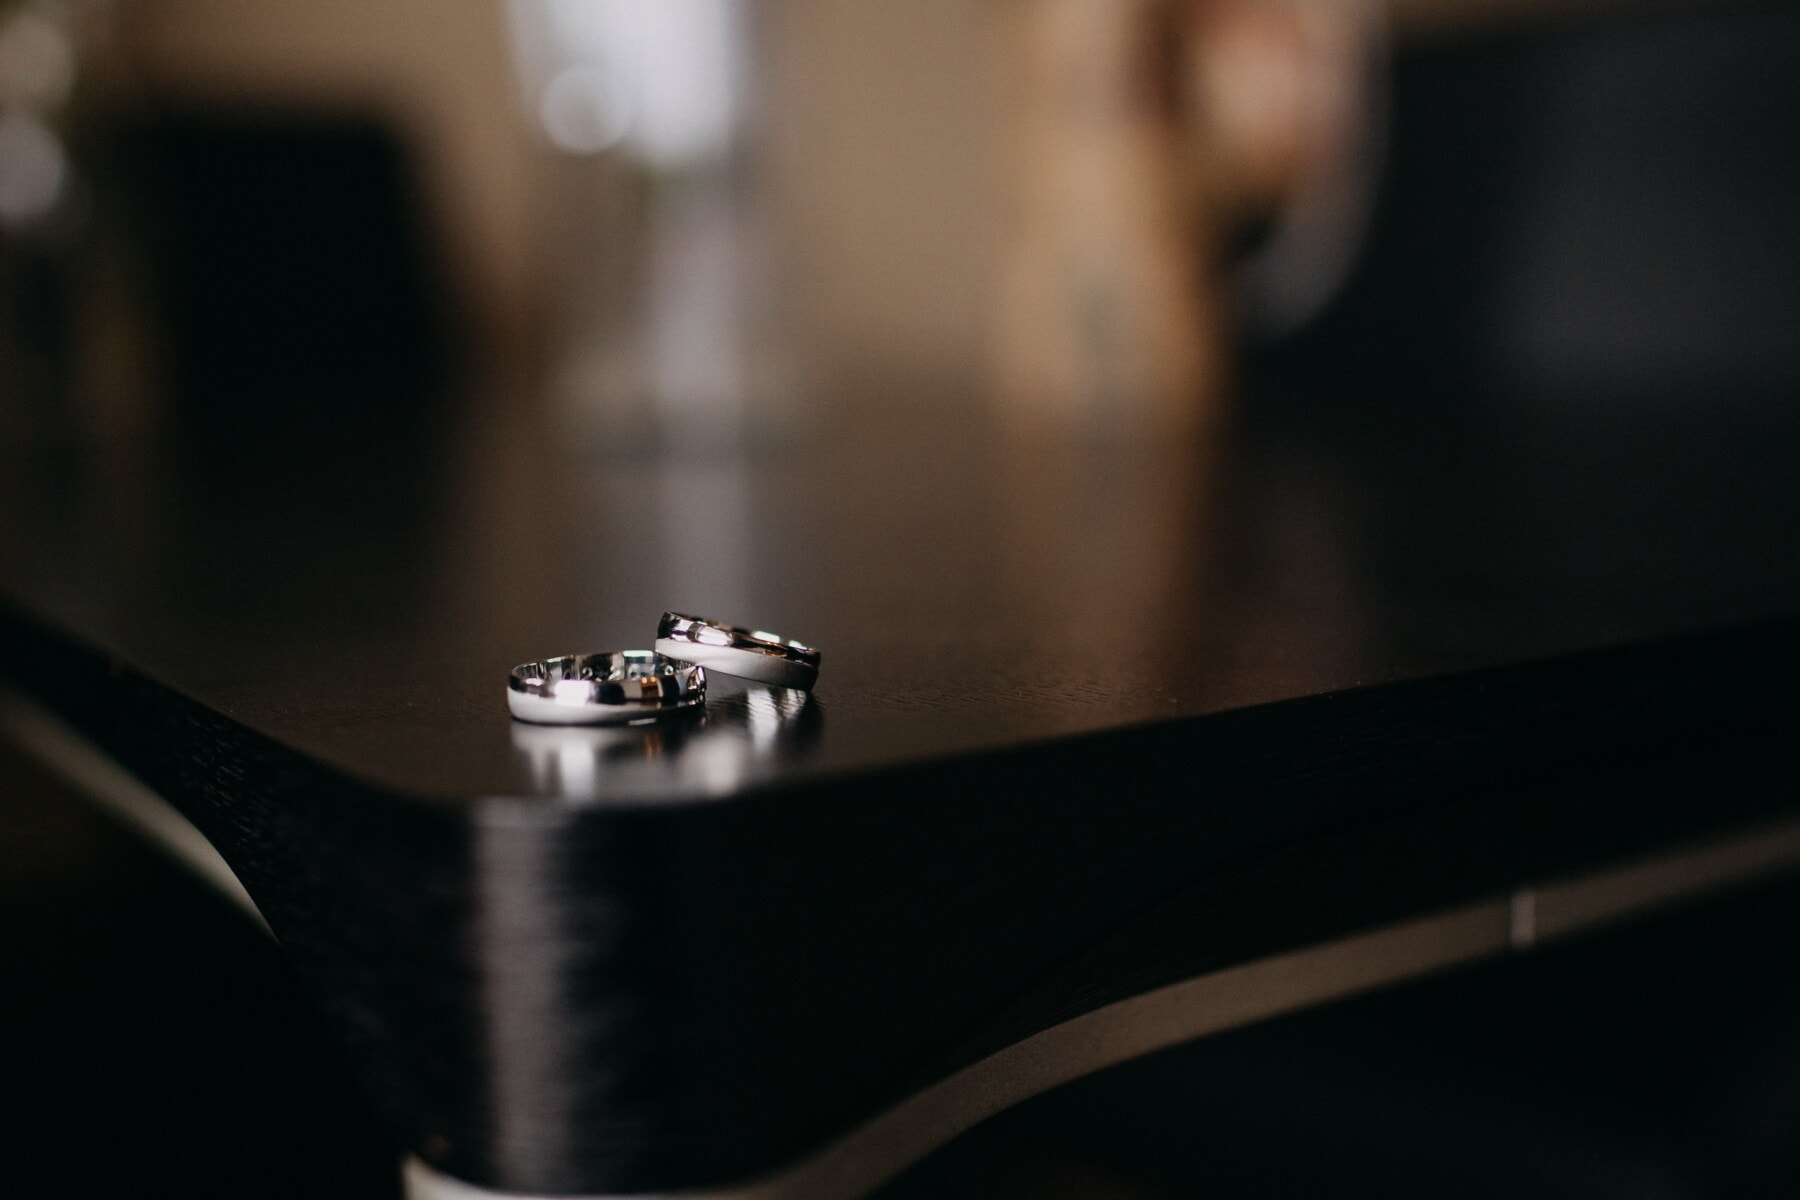 wedding ring, pair, close-up, reflection, shadow, blur, still life, studio, indoors, room